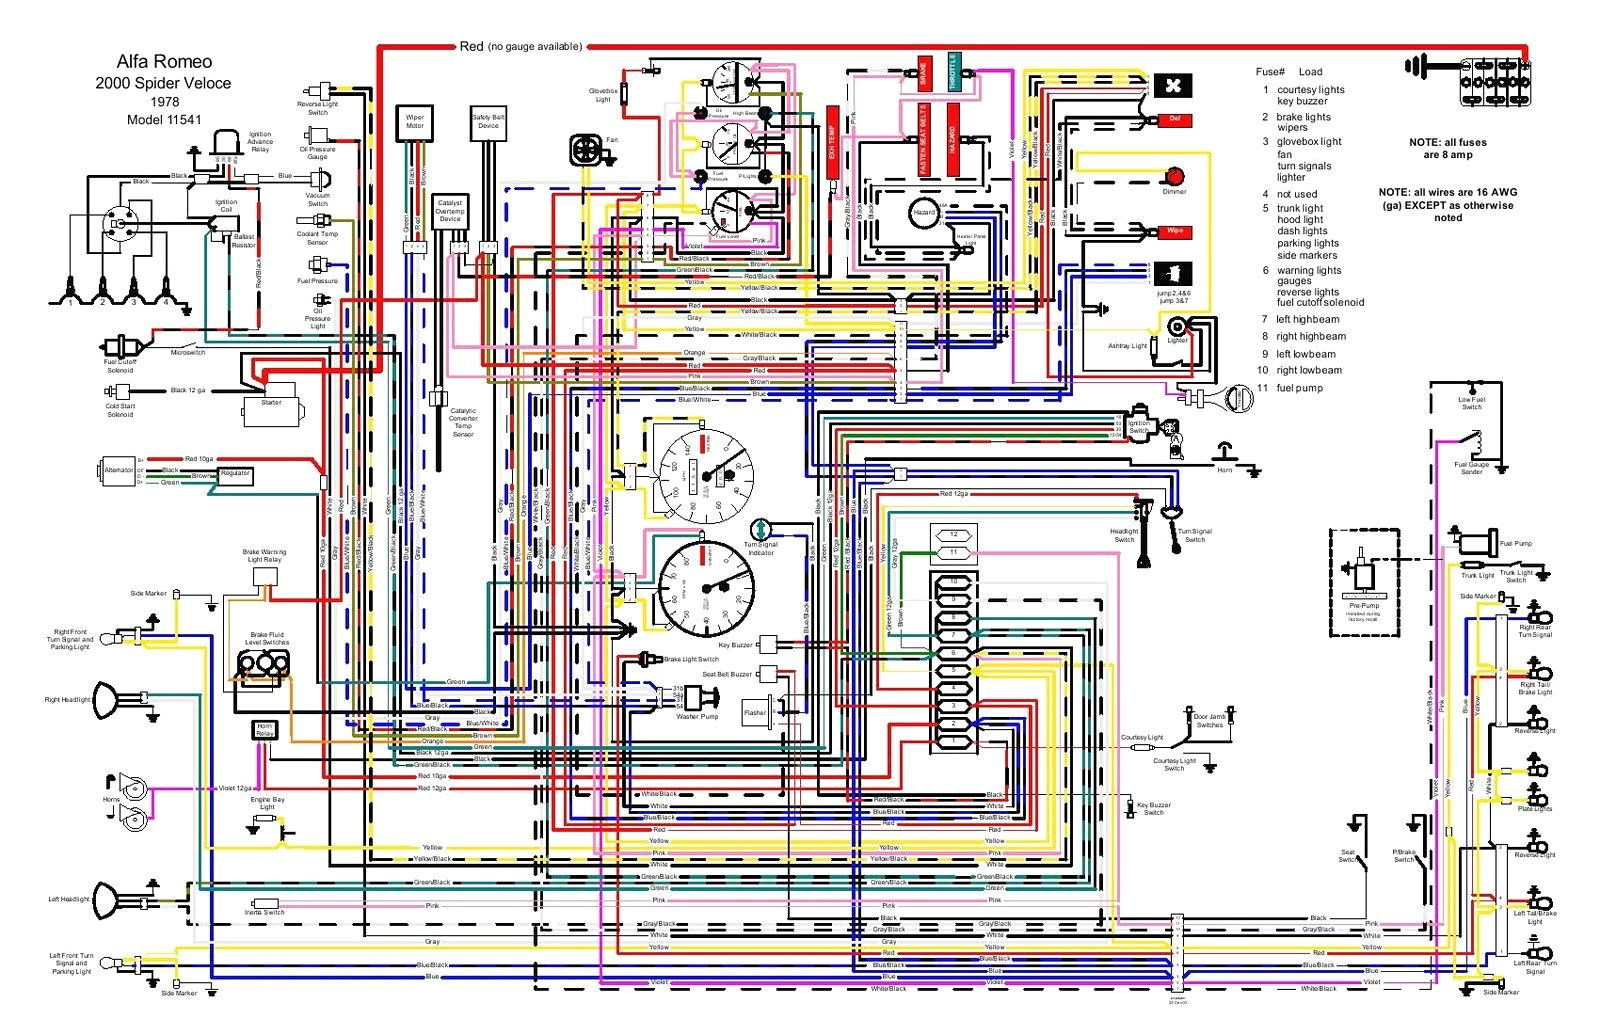 yamaha fz1 wiring diagram alfa romeo gt diagrams wiring diagramalfa romeo gt wiring diagram alfa romeo 147 radio wiring diagramalfa romeo gt wiring diagram wiring